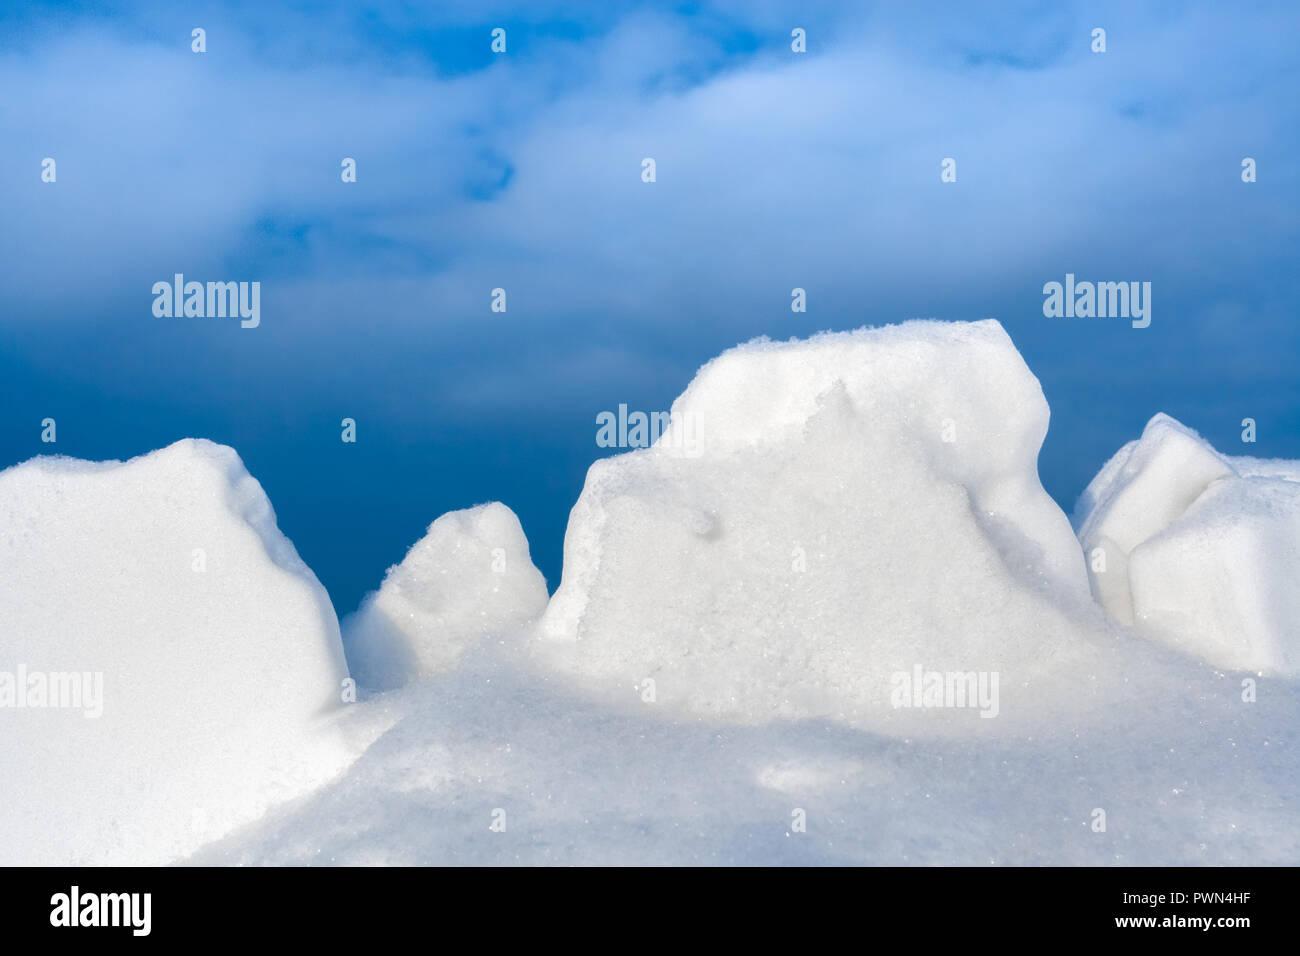 Close-up white snow lumps against blue sky.  - Stock Image